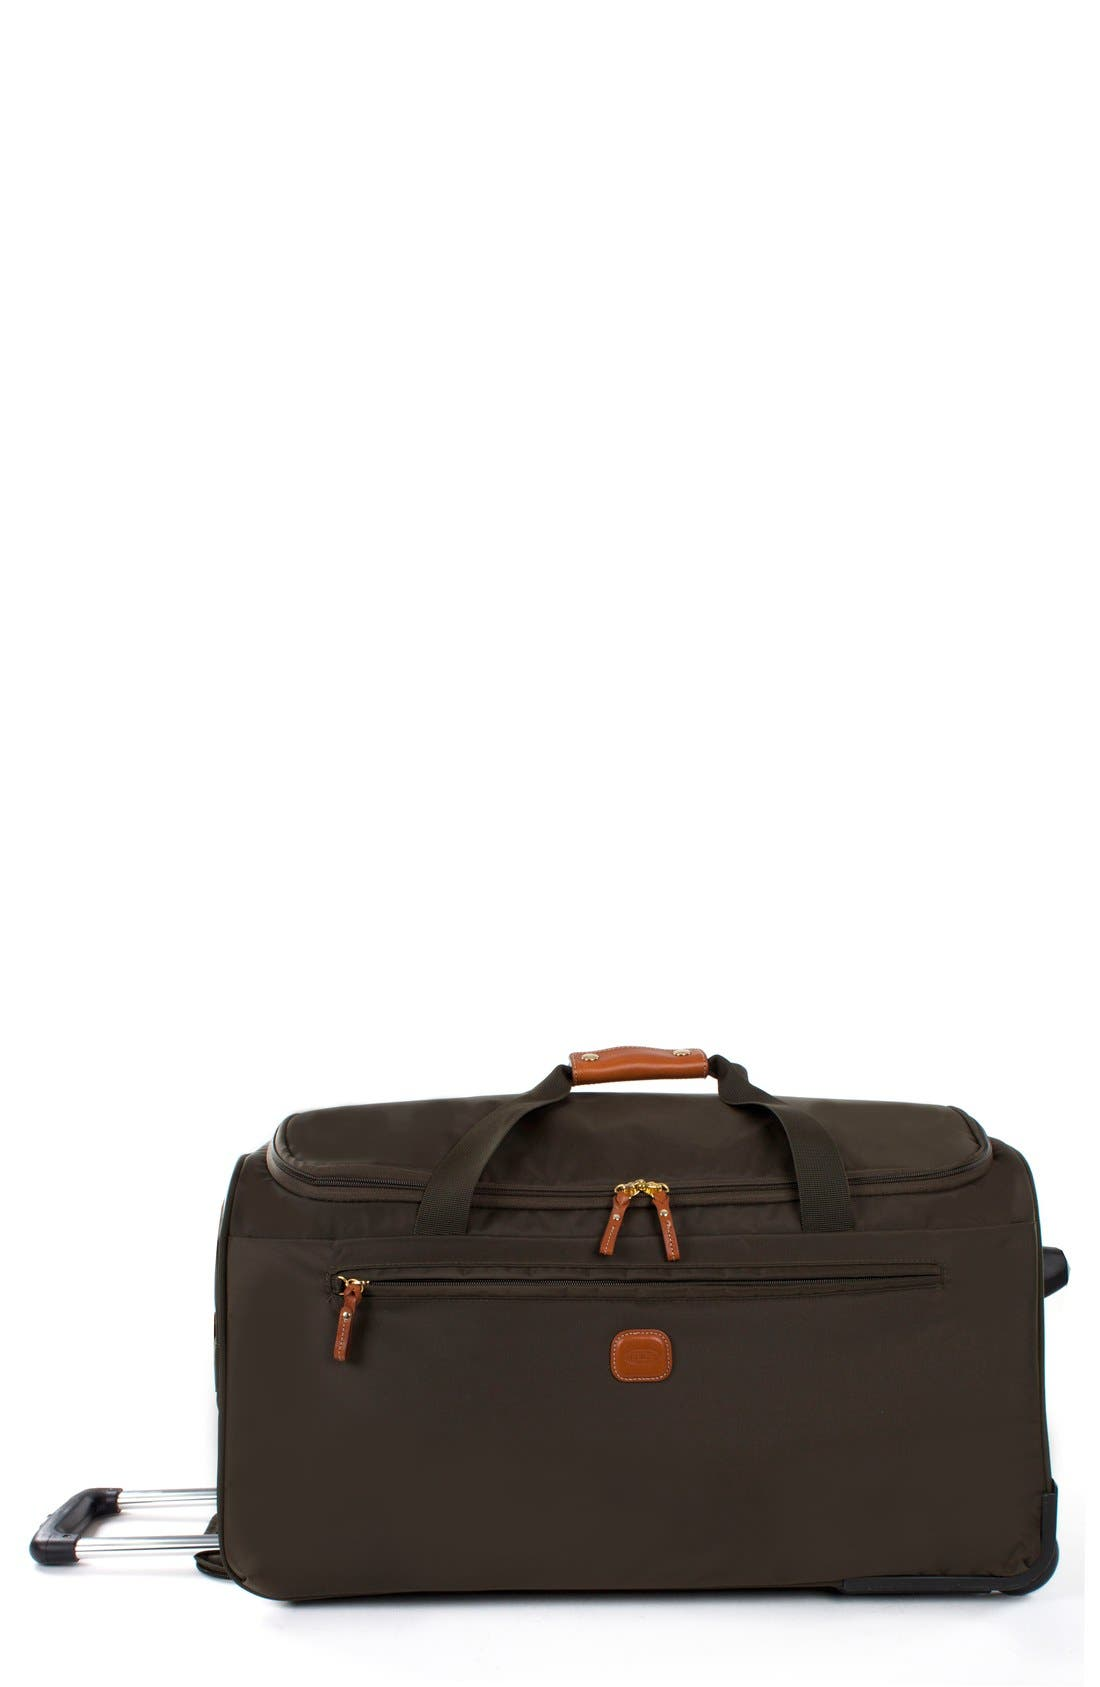 X-Bag 28-Inch Rolling Duffel Bag,                             Main thumbnail 1, color,                             Olive